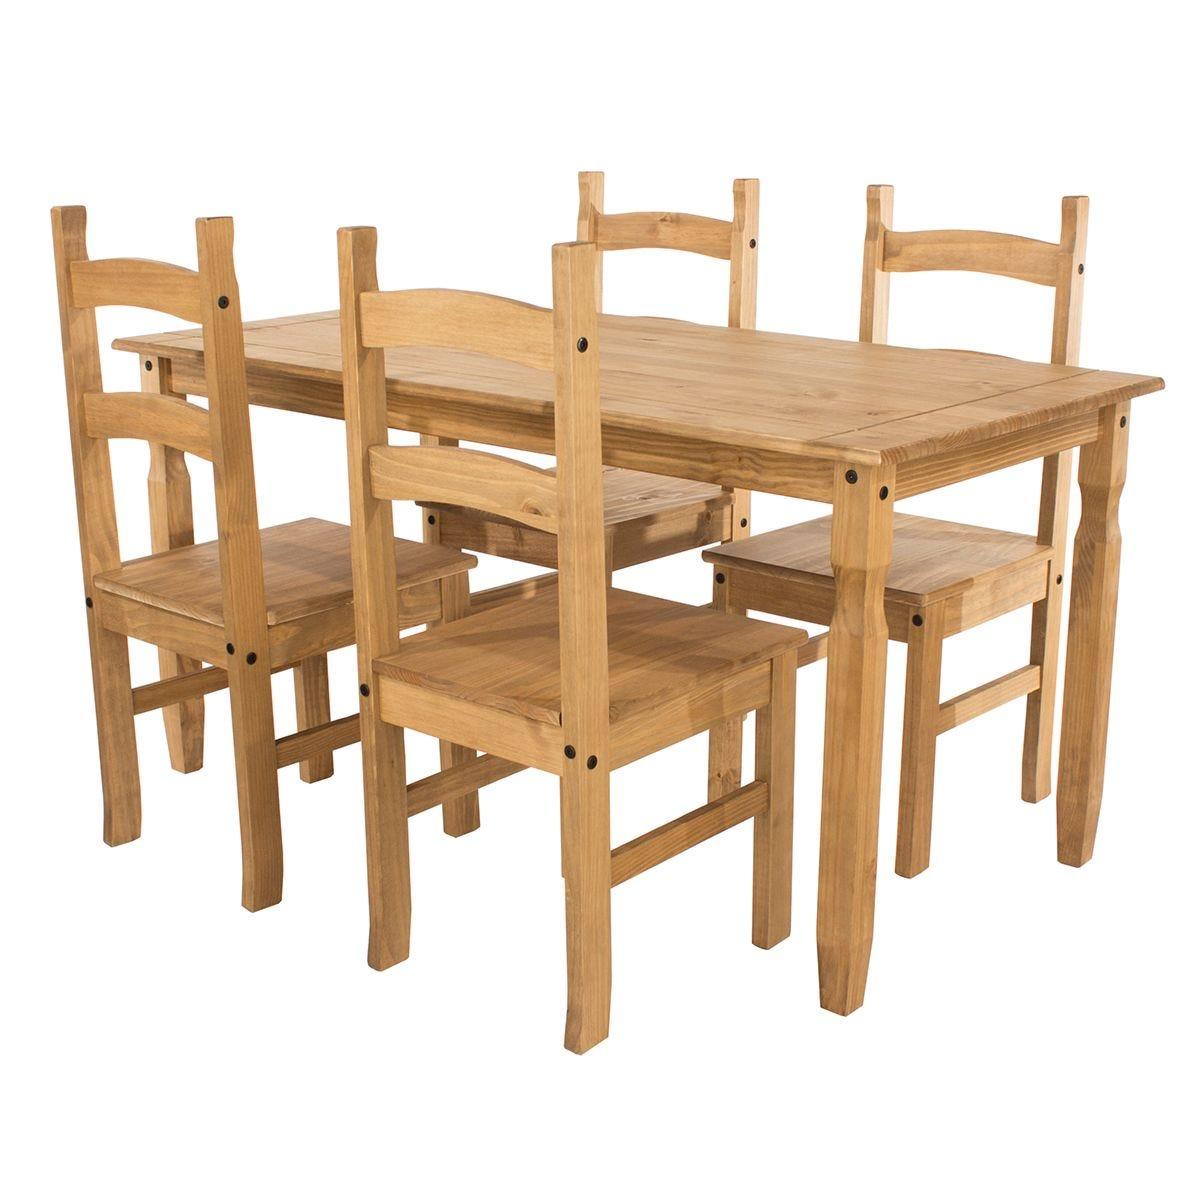 Halea Medium Rectangular Dining Table & 4 Chairs